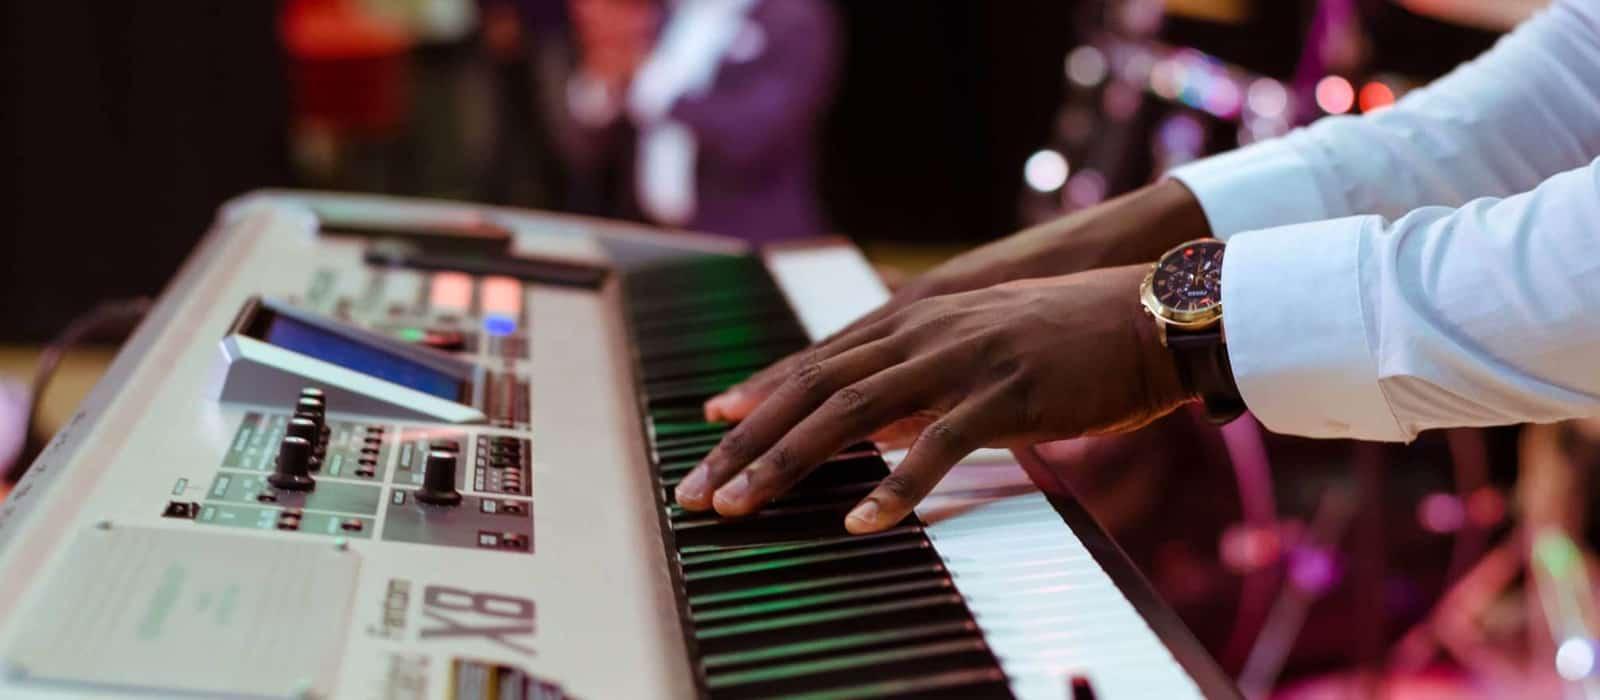 grupos musicales para fiestas, pianista